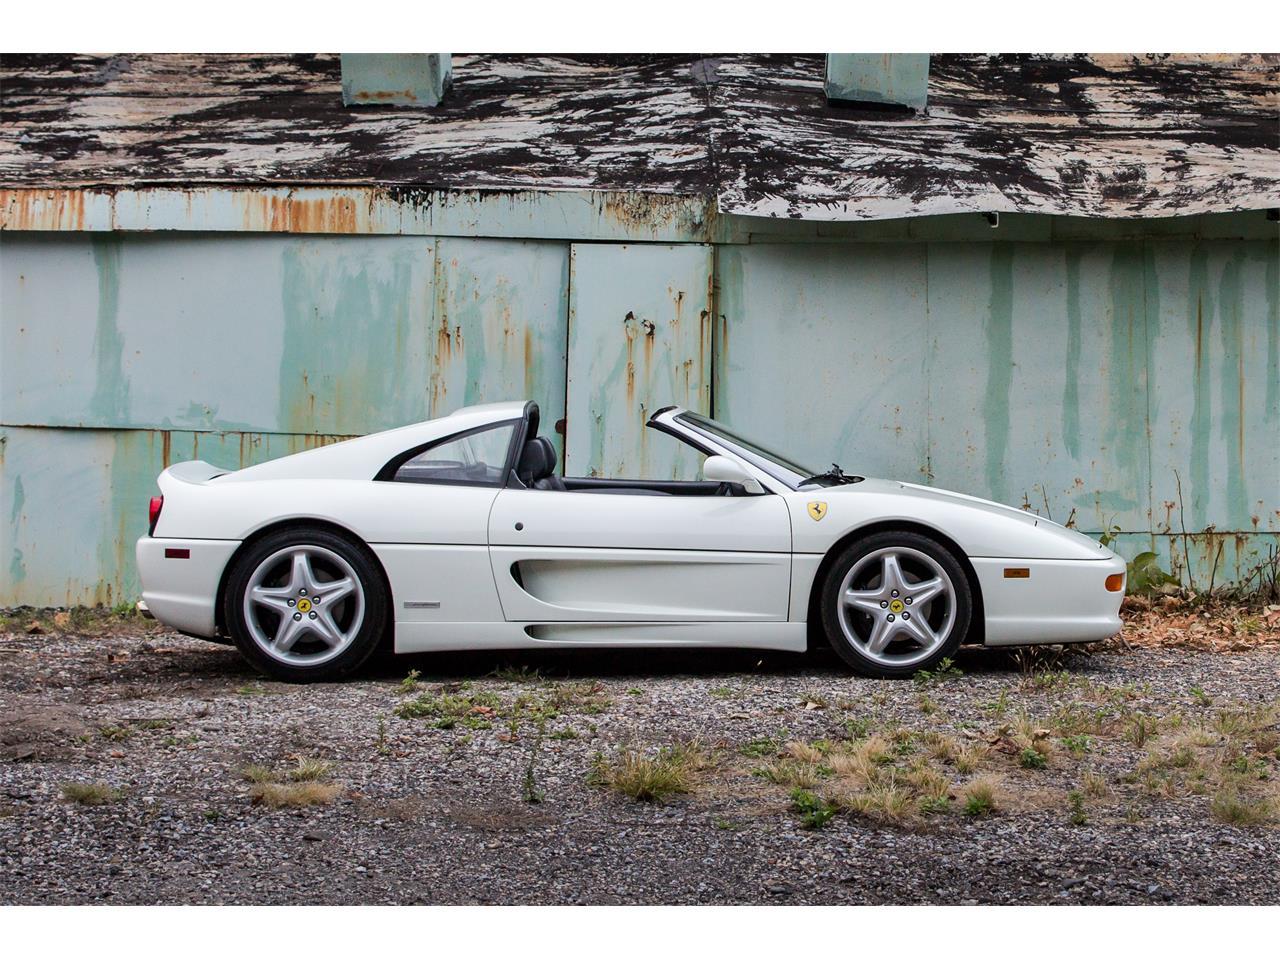 1999 Ferrari F355 Gts For Sale Classiccars Com Cc 1035775